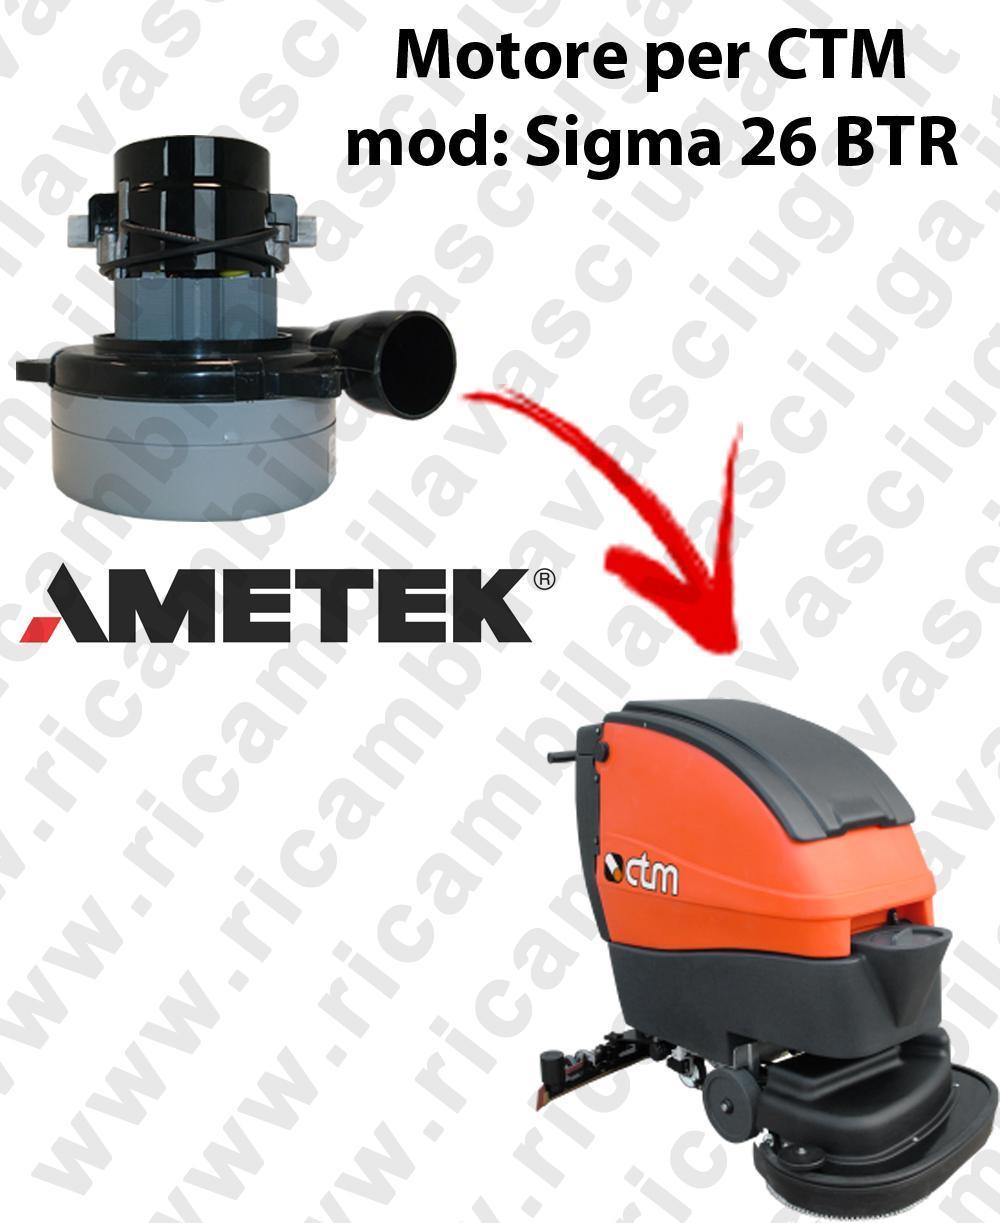 SIGMA 26 BTR Motore de aspiración LAMB AMETEK para fregadora CTM